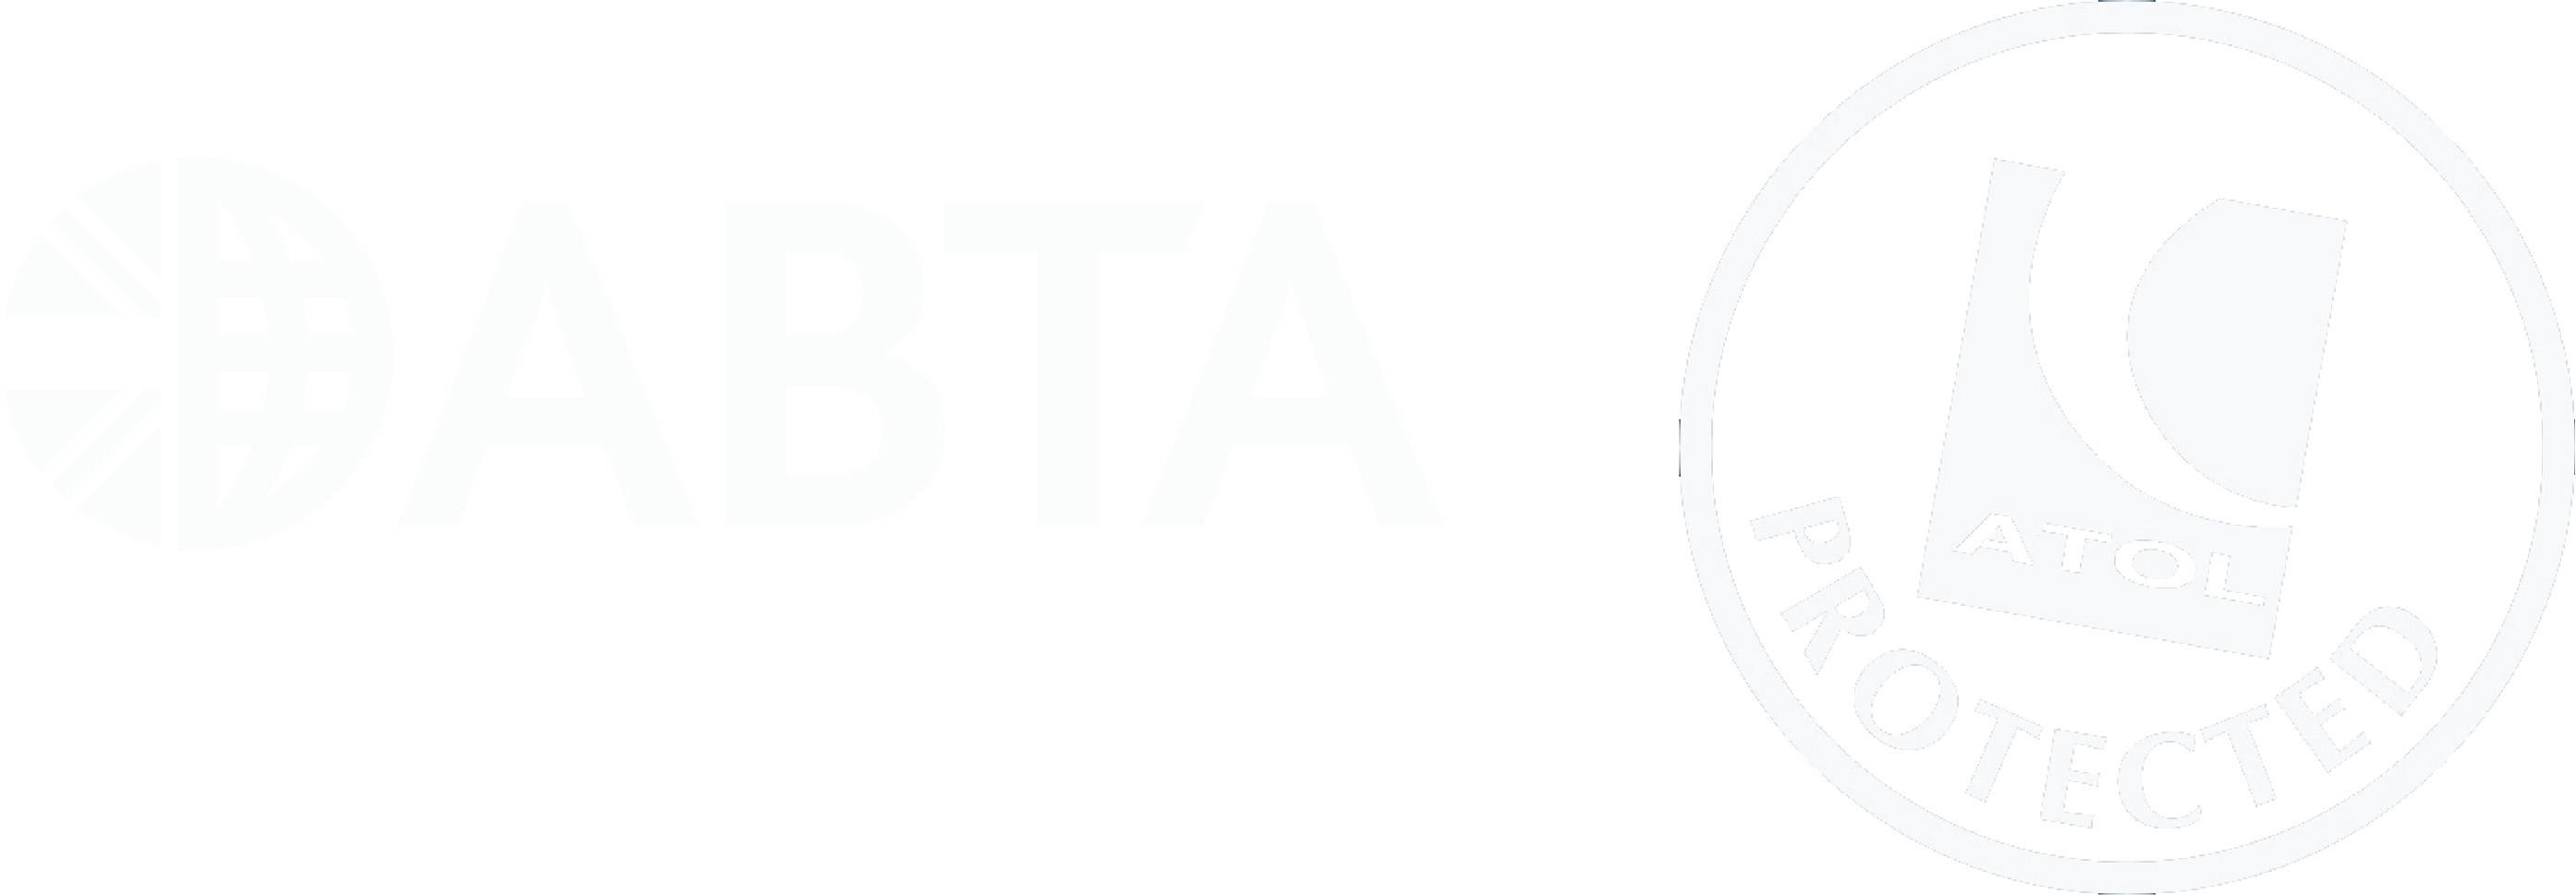 . PlusPng.com United Kingdom ABTA ATOL - Abta PNG